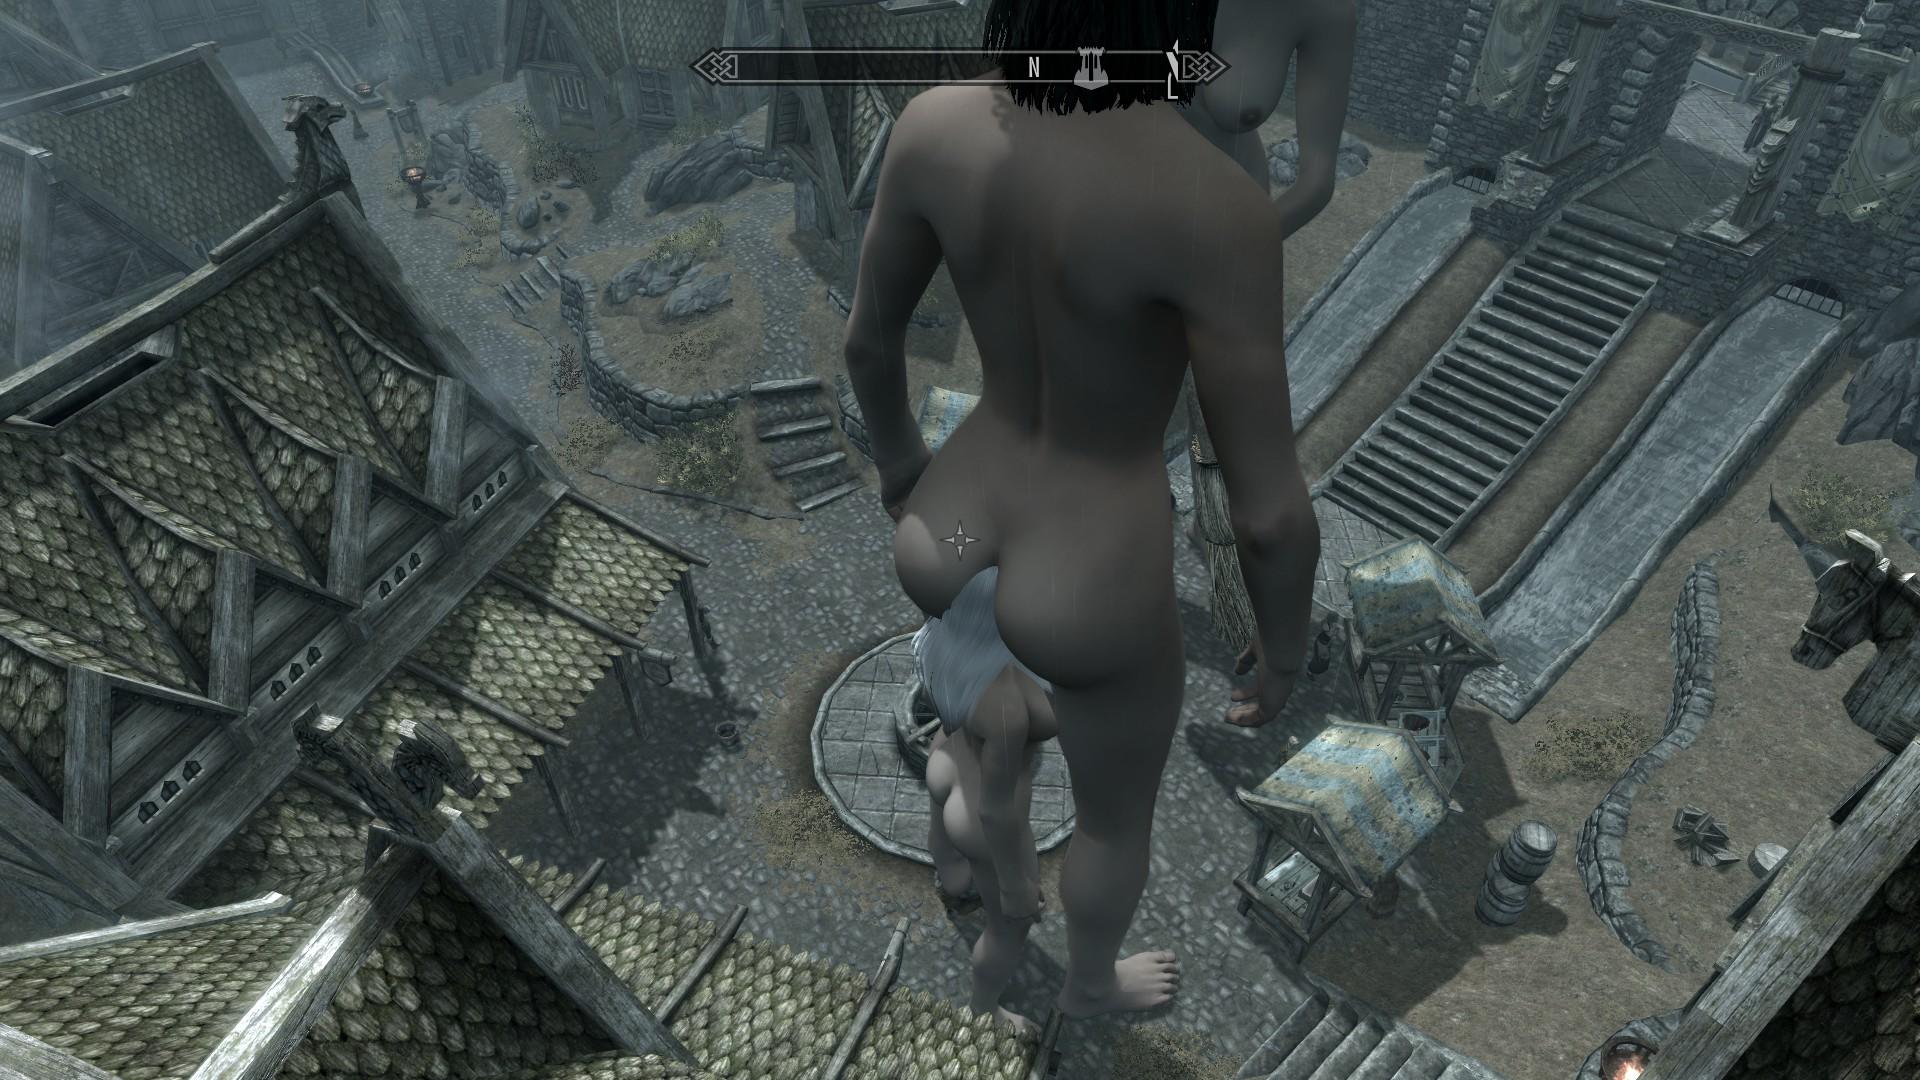 Have skyrim astrid naked